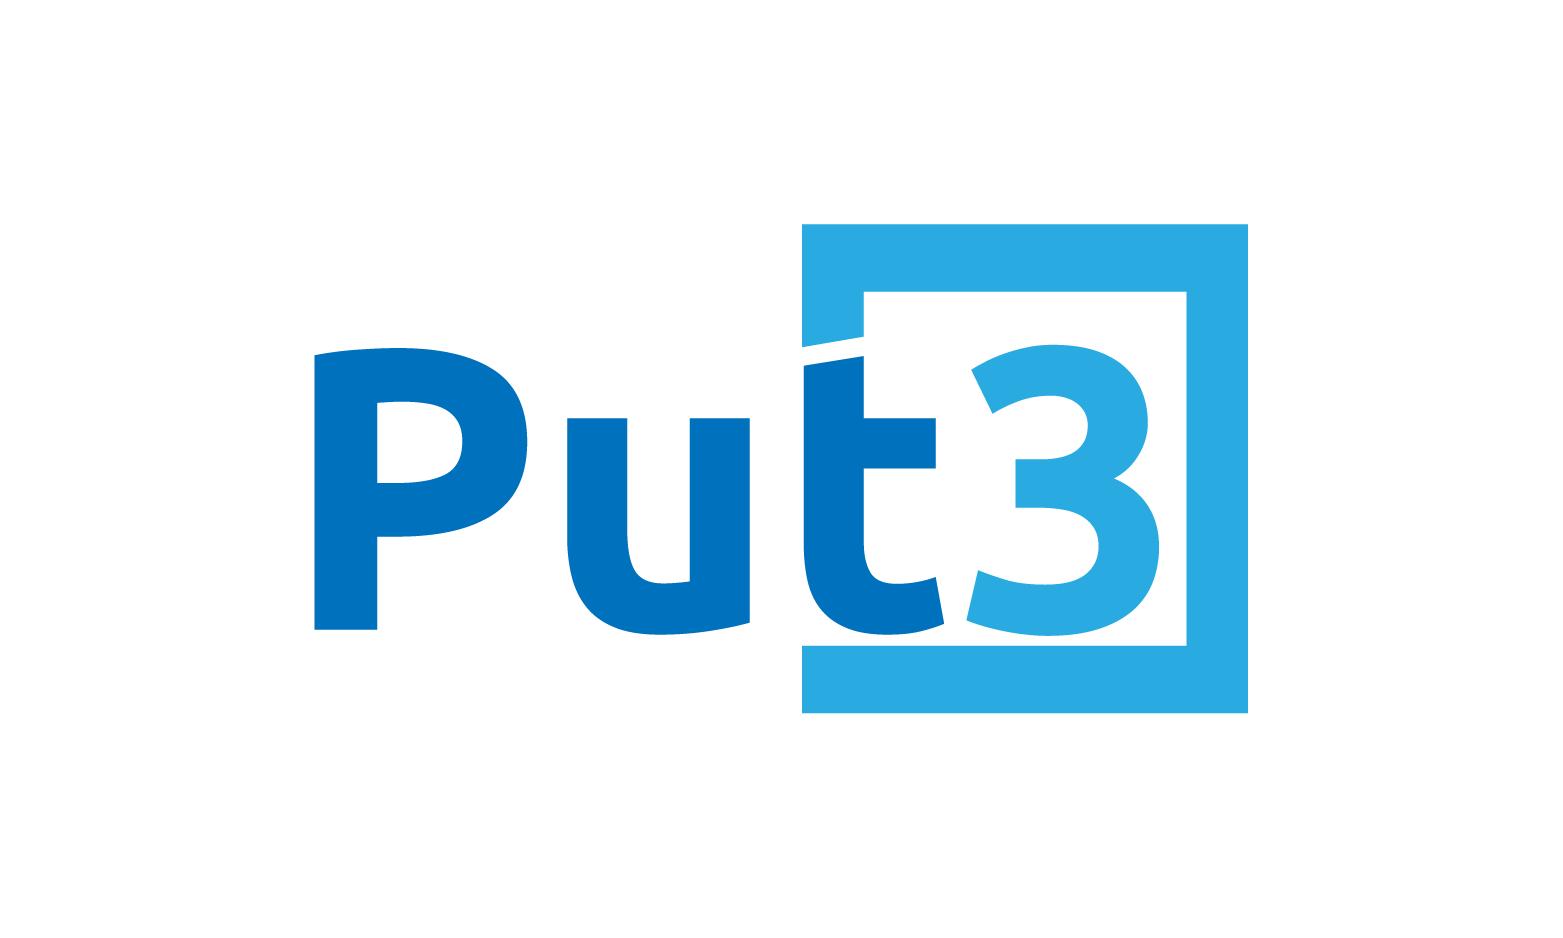 Put3.com